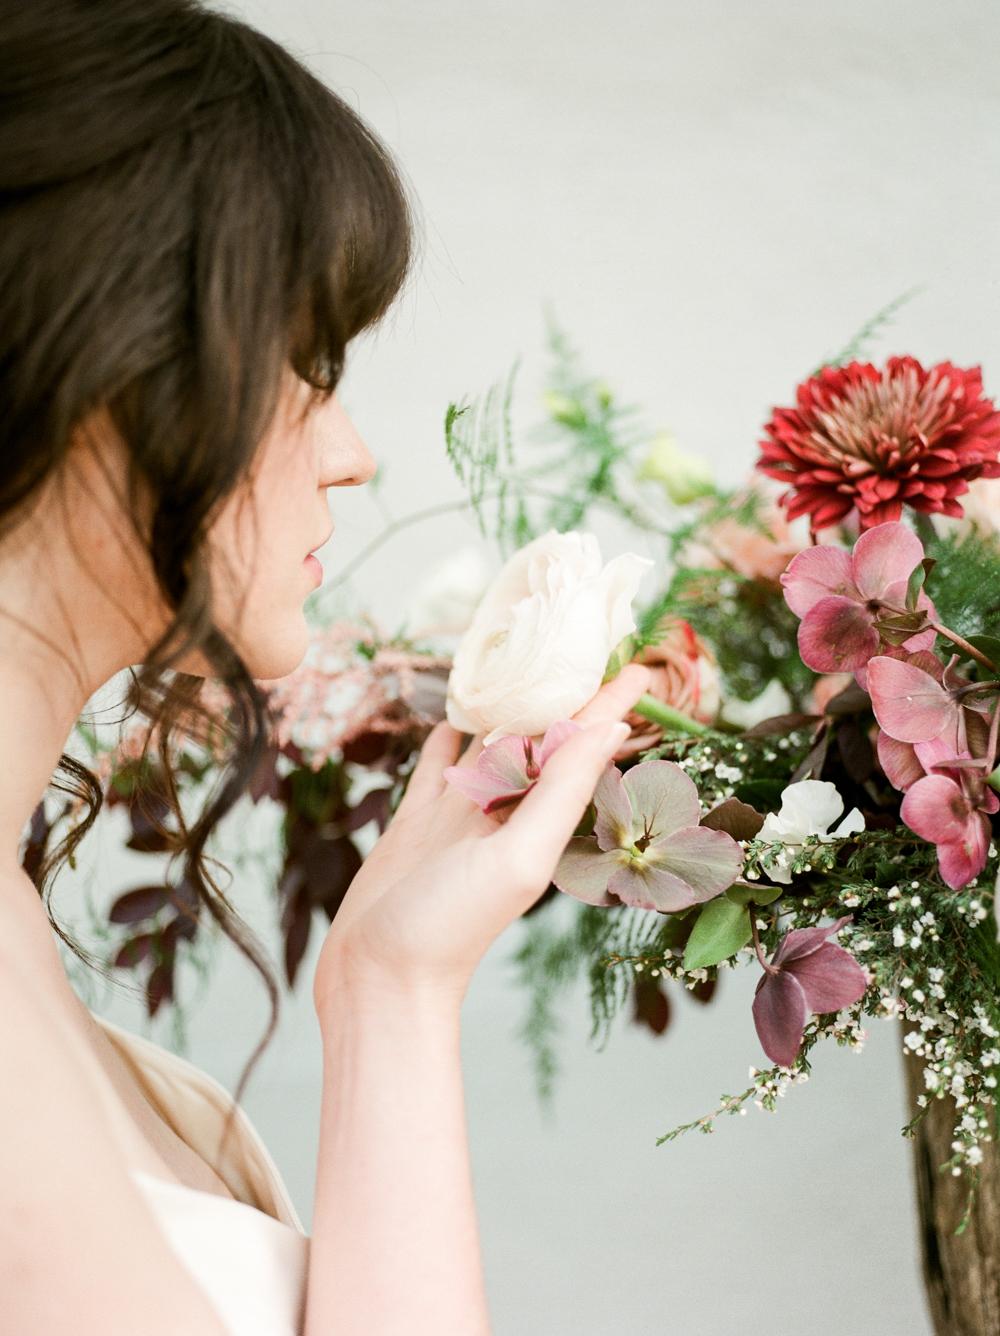 A lovely houston bride_wedding_Christine Gosch_www.christinegosch.com_Houston, TX-9.jpg